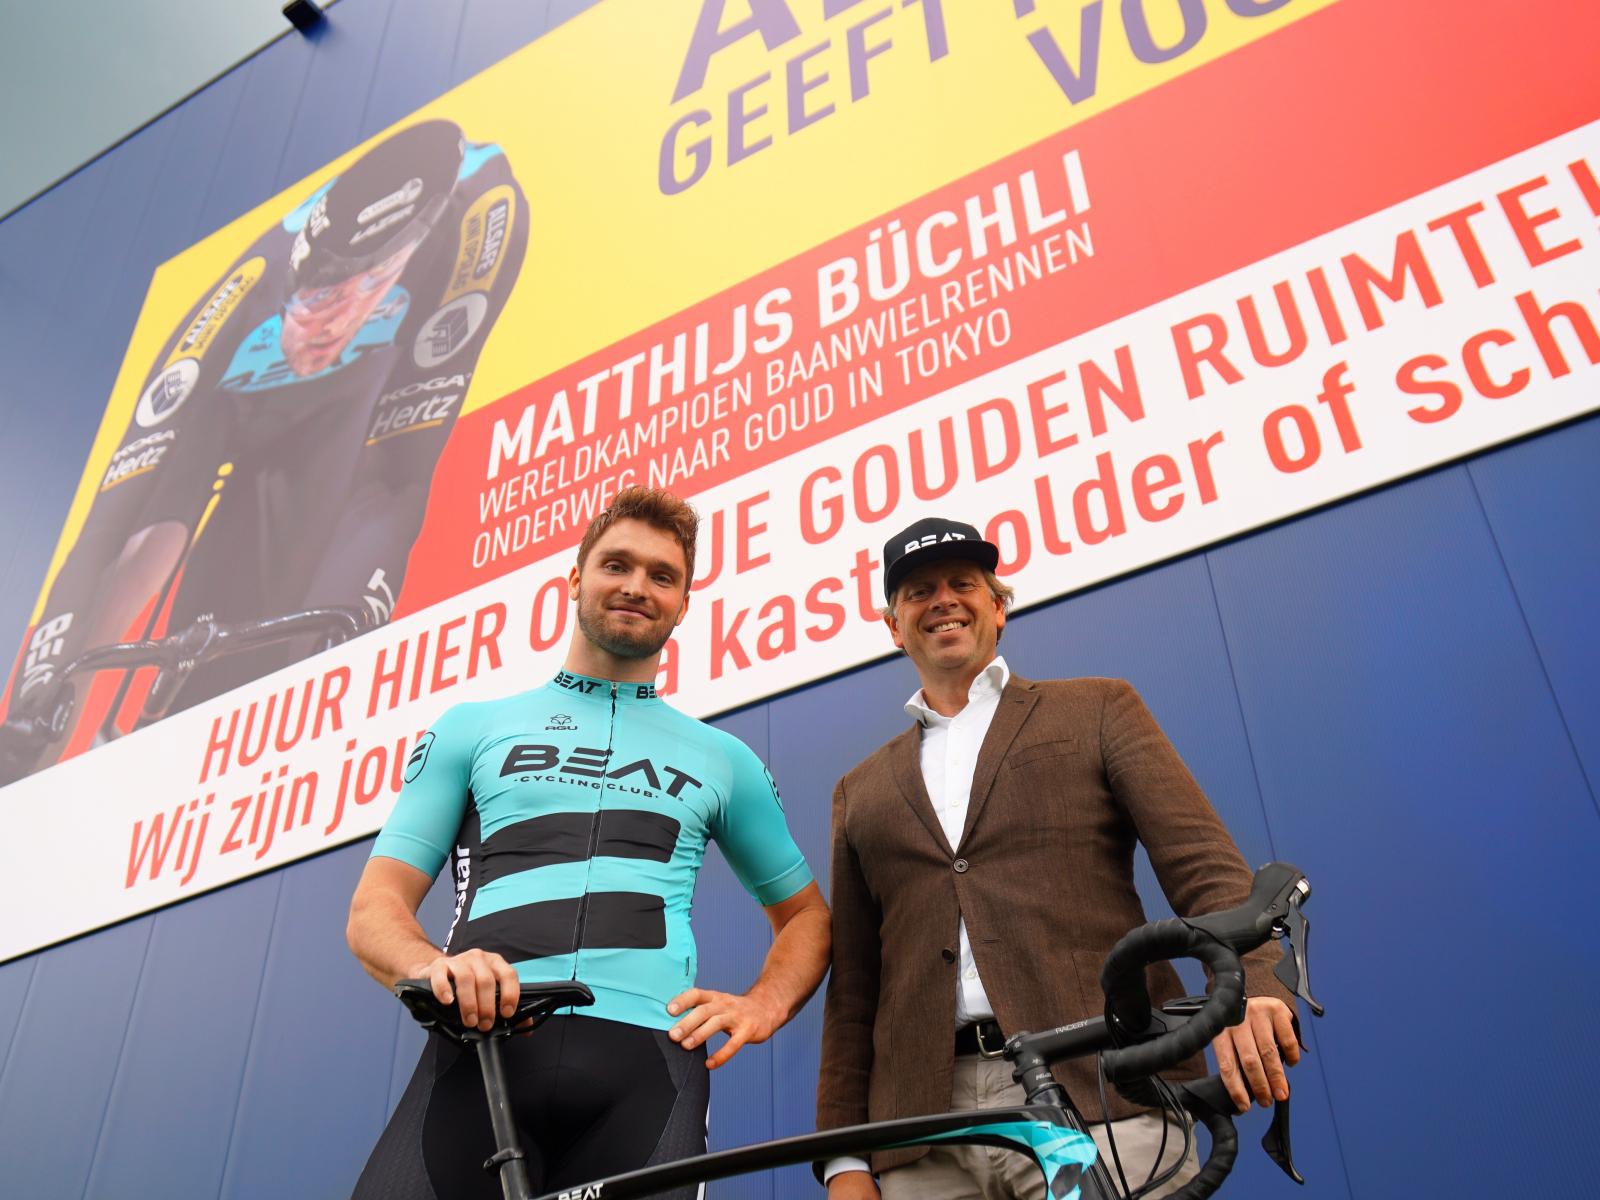 ALLSAFE geeft Matthijs Büchli ruimte voor olympisch goud